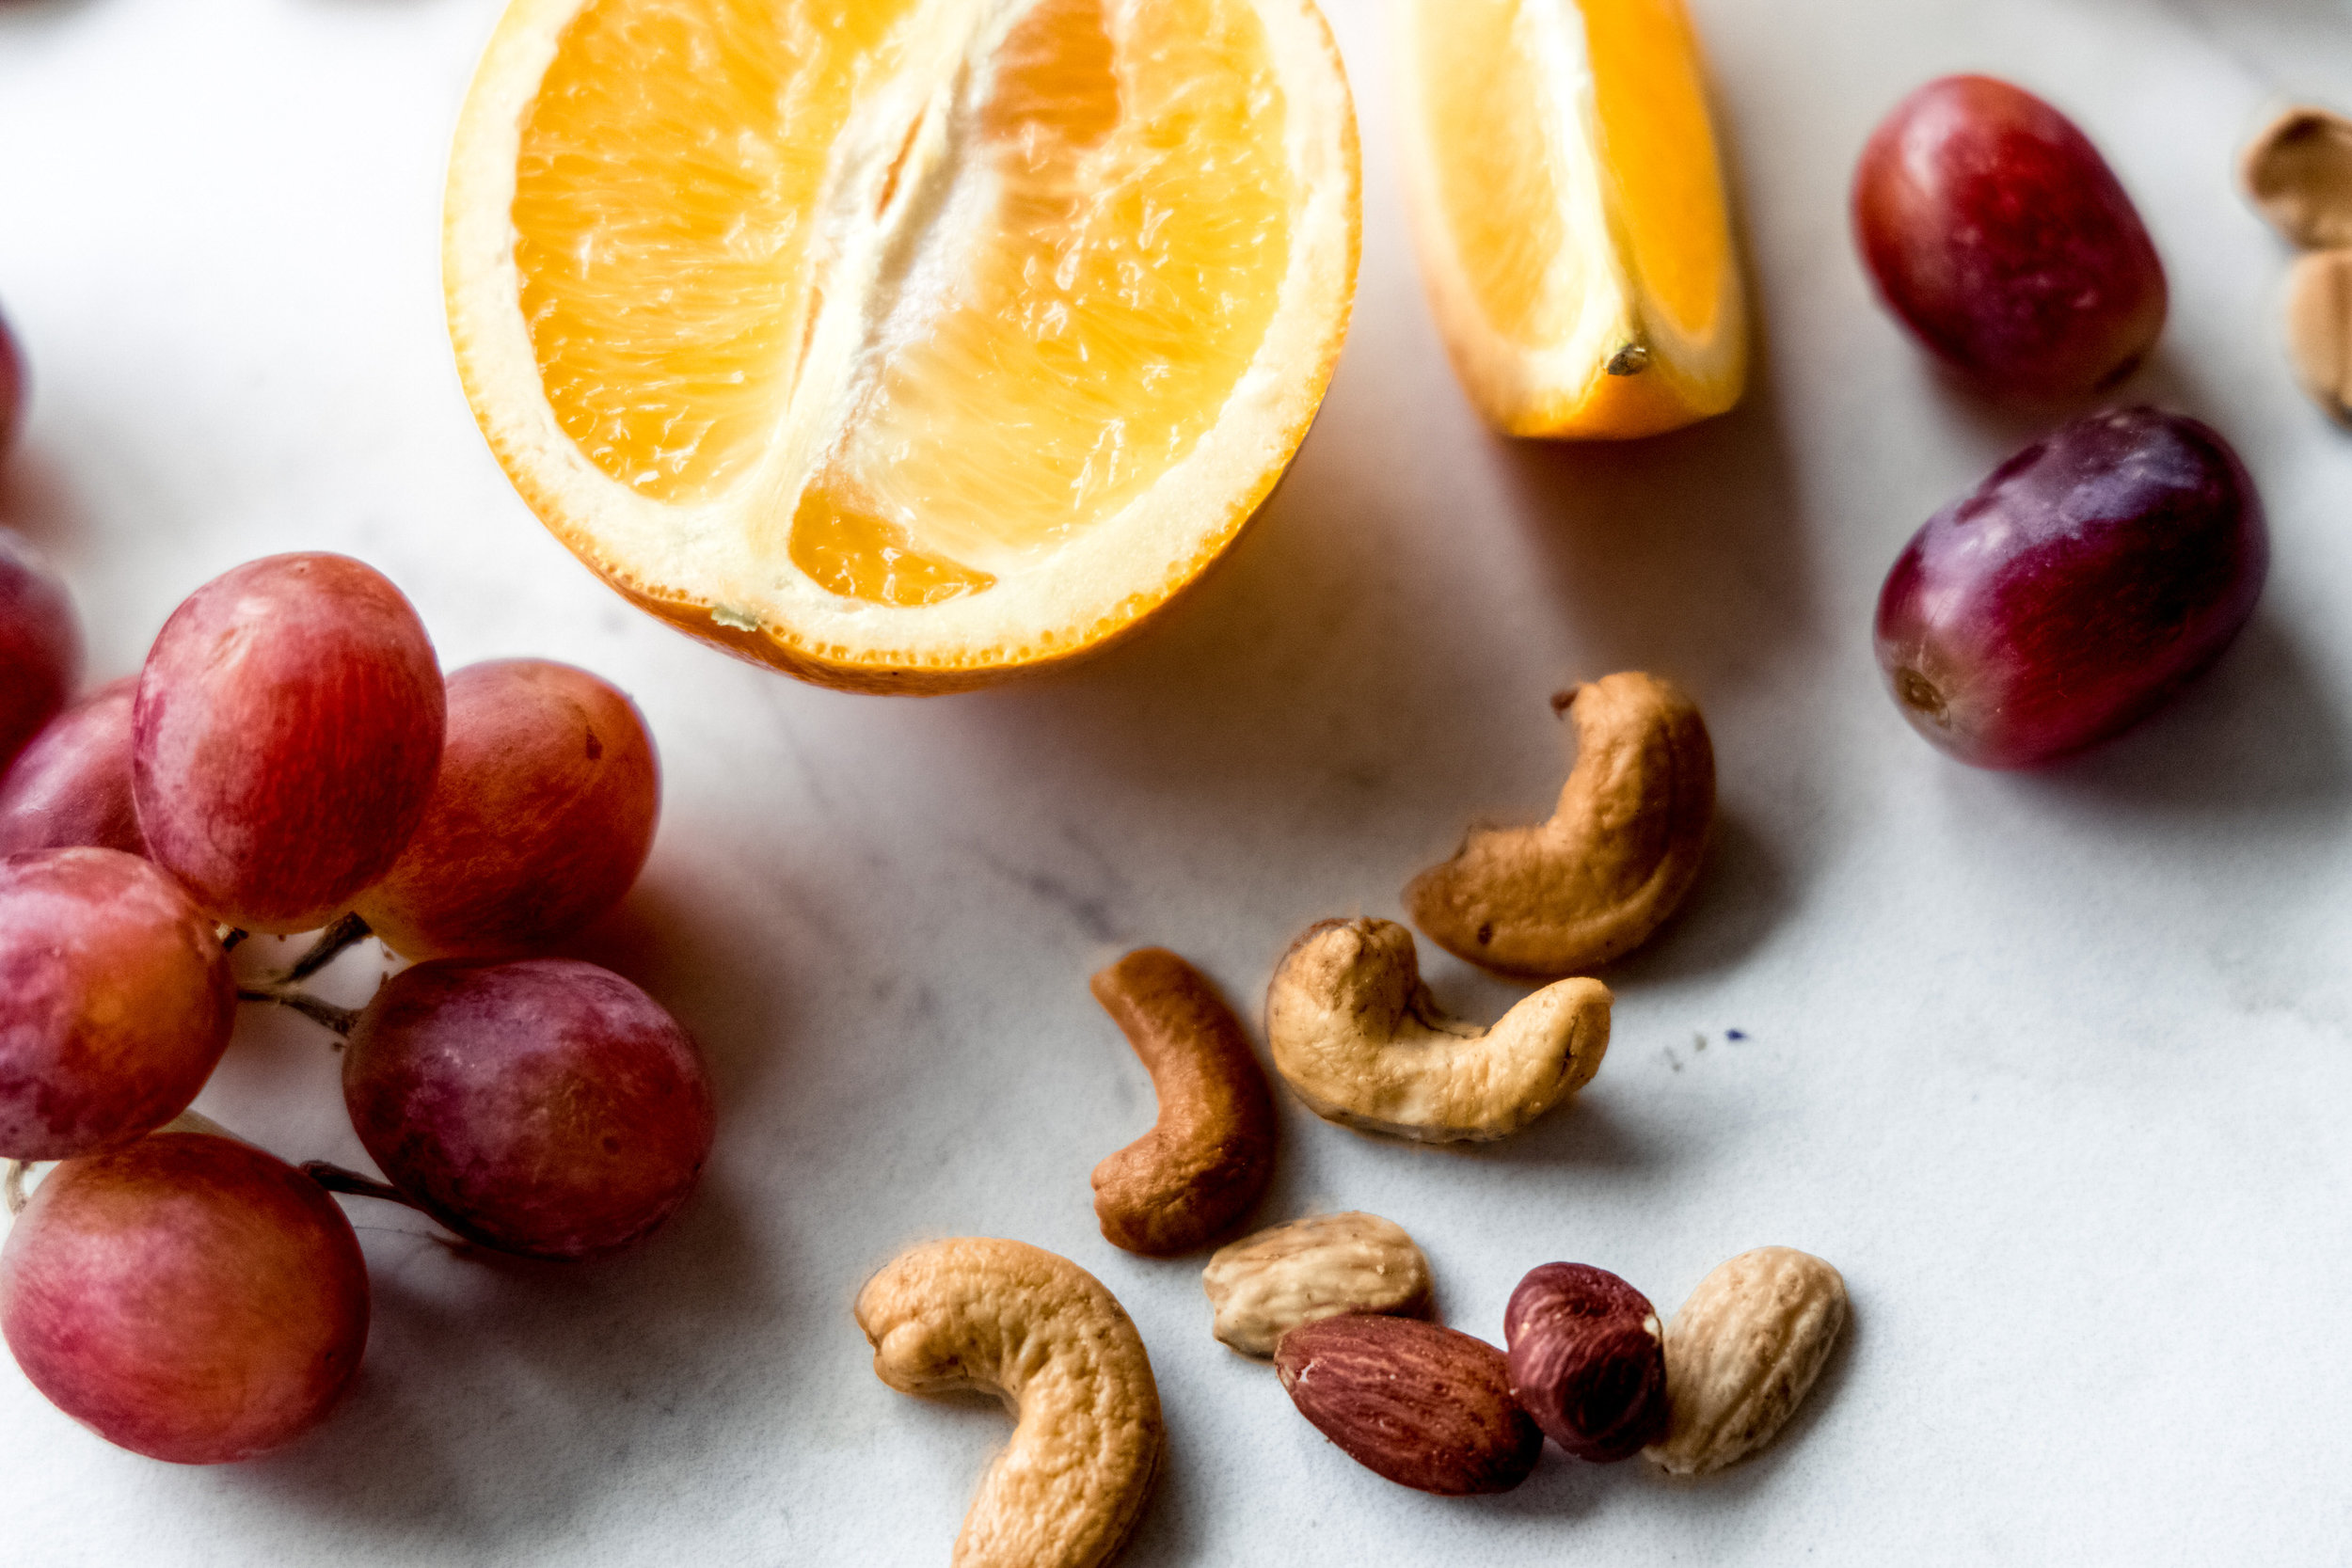 nutrition-images-0539.jpg